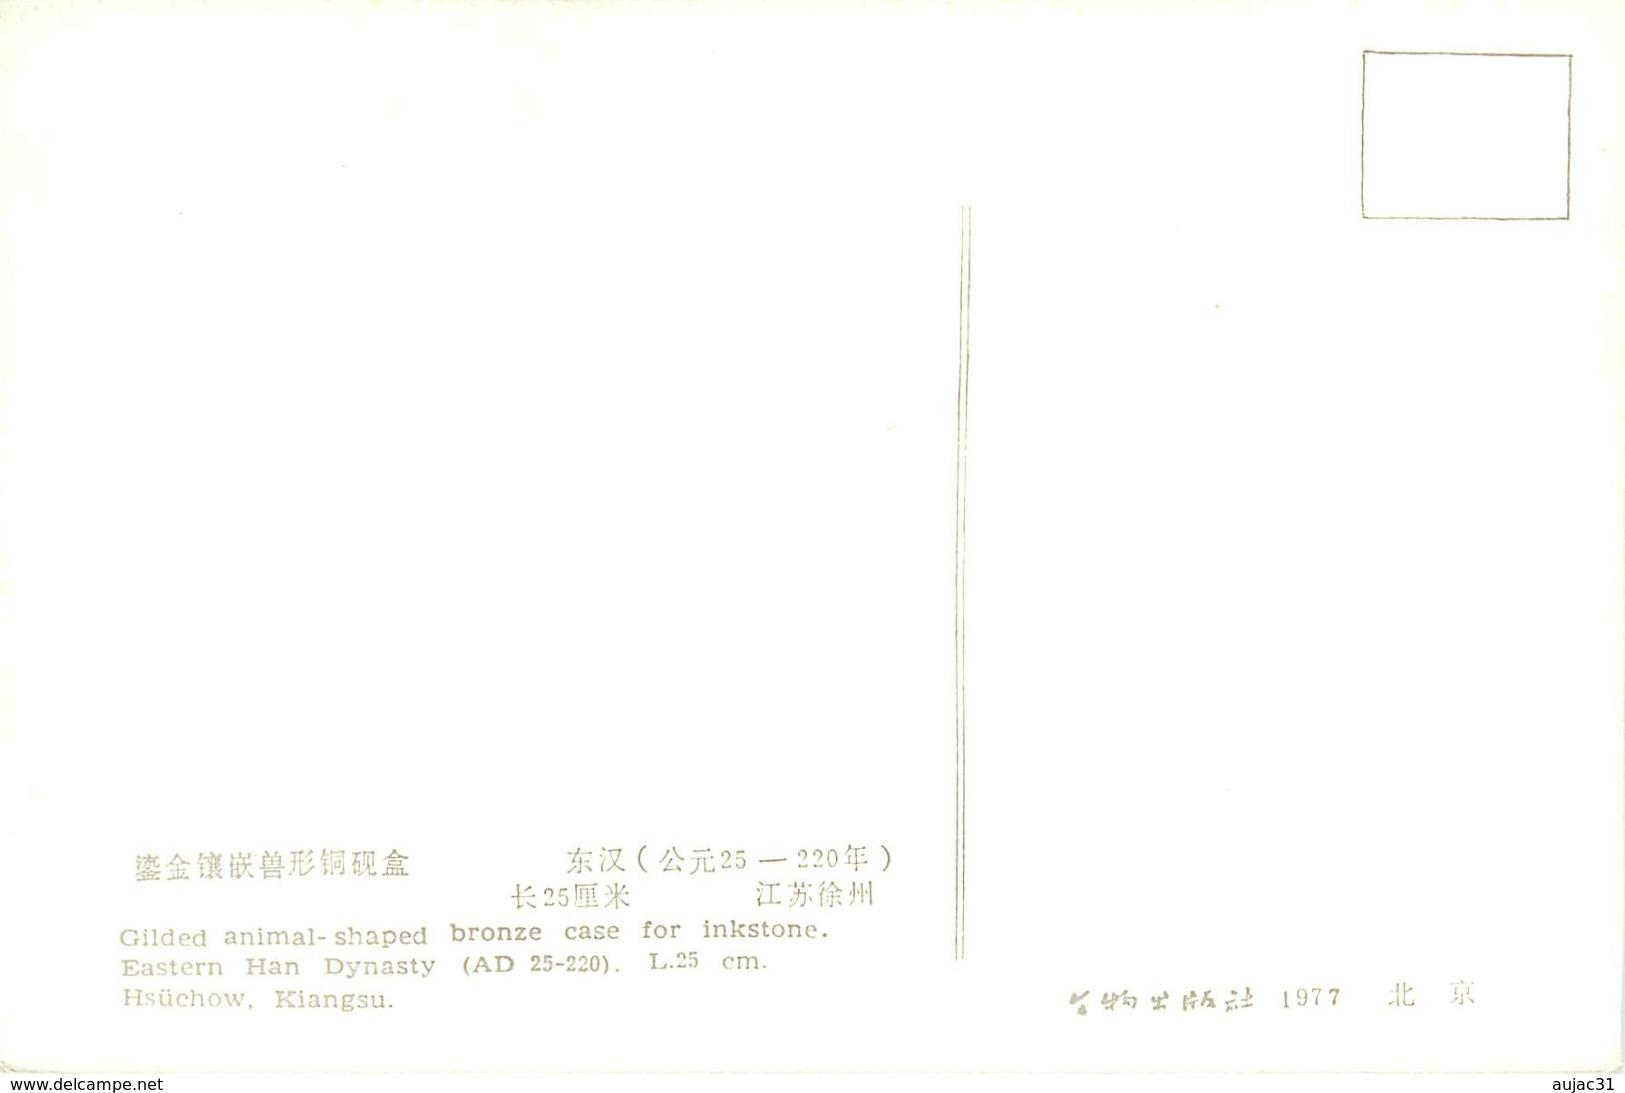 Chine - China - Kiangsu - Jiangsu - Arts - Art - Bronzes - 10 Cartes Avec Pochette - Semi Moderne Grand Format -bon état - Chine